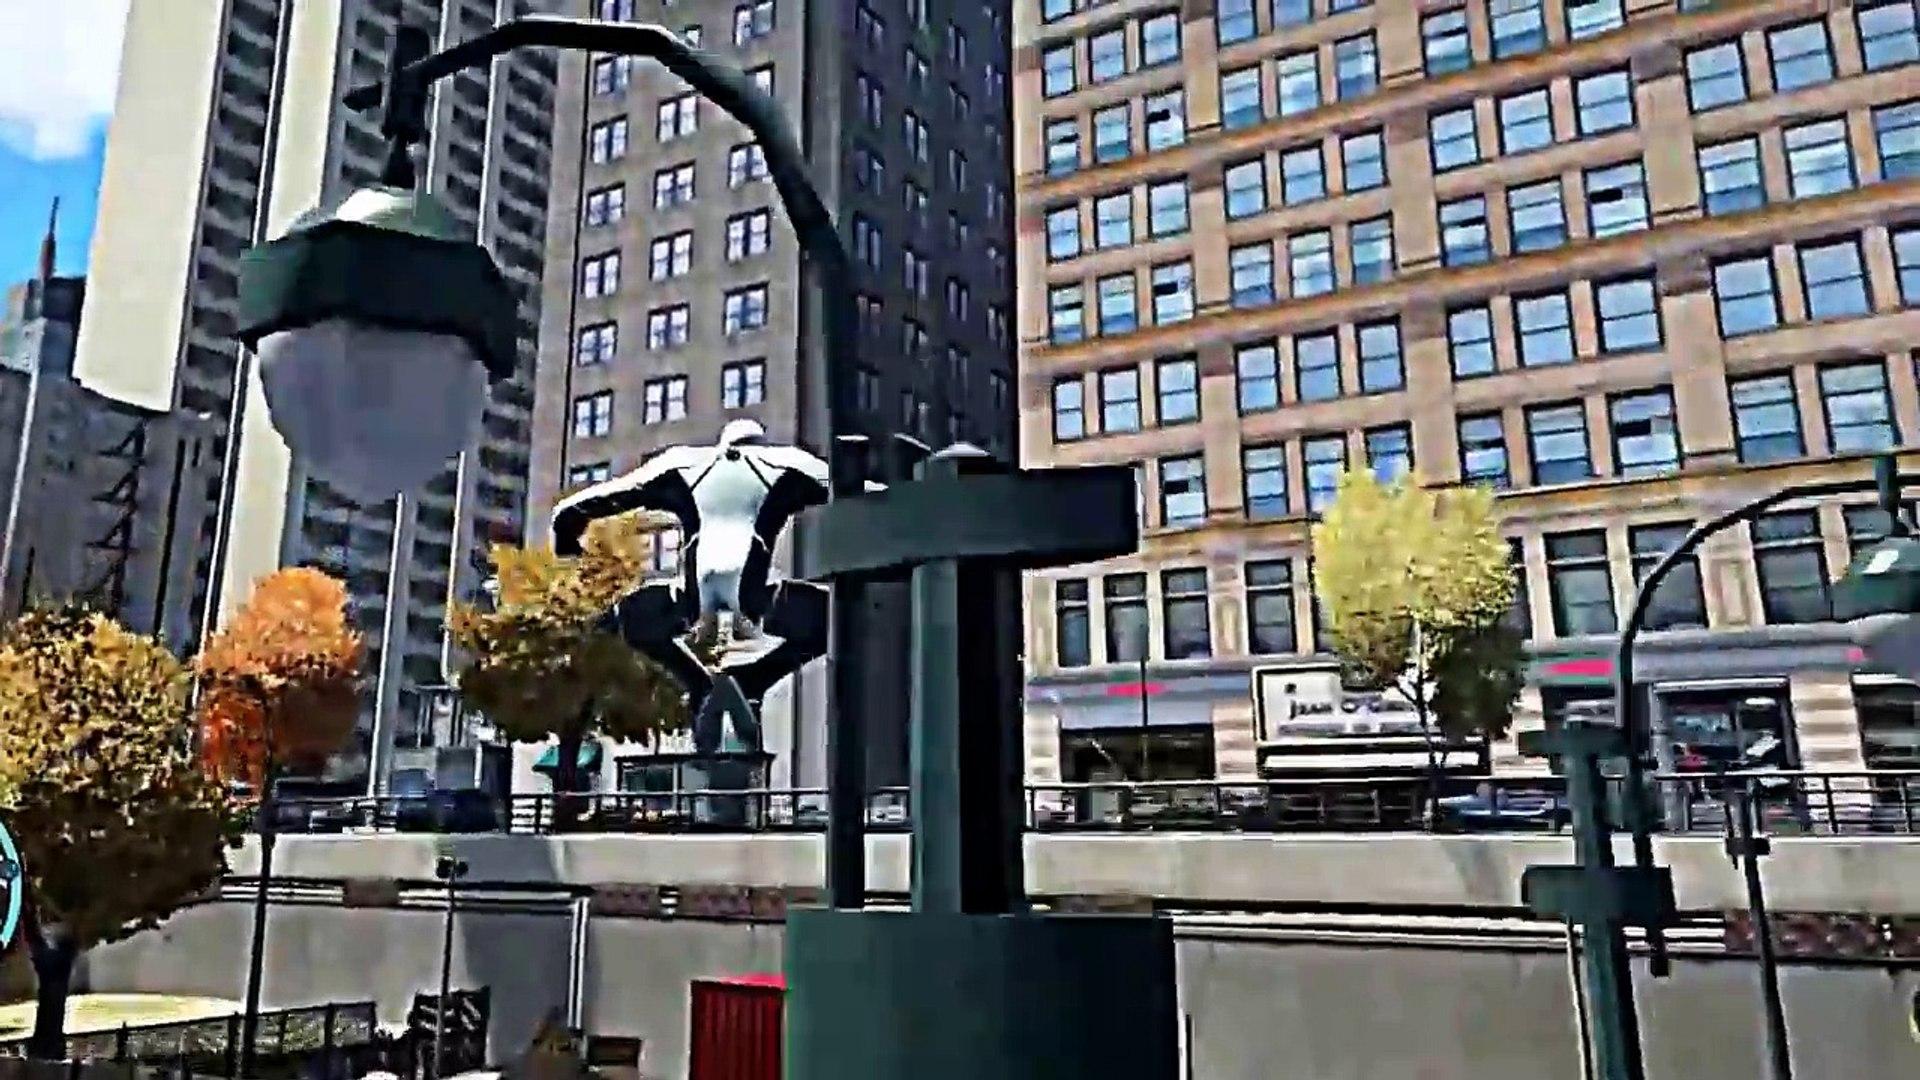 gta iv gameplay : spiderman vs venom epic battle   Gta IV Spiderman Mod Walkthrough !